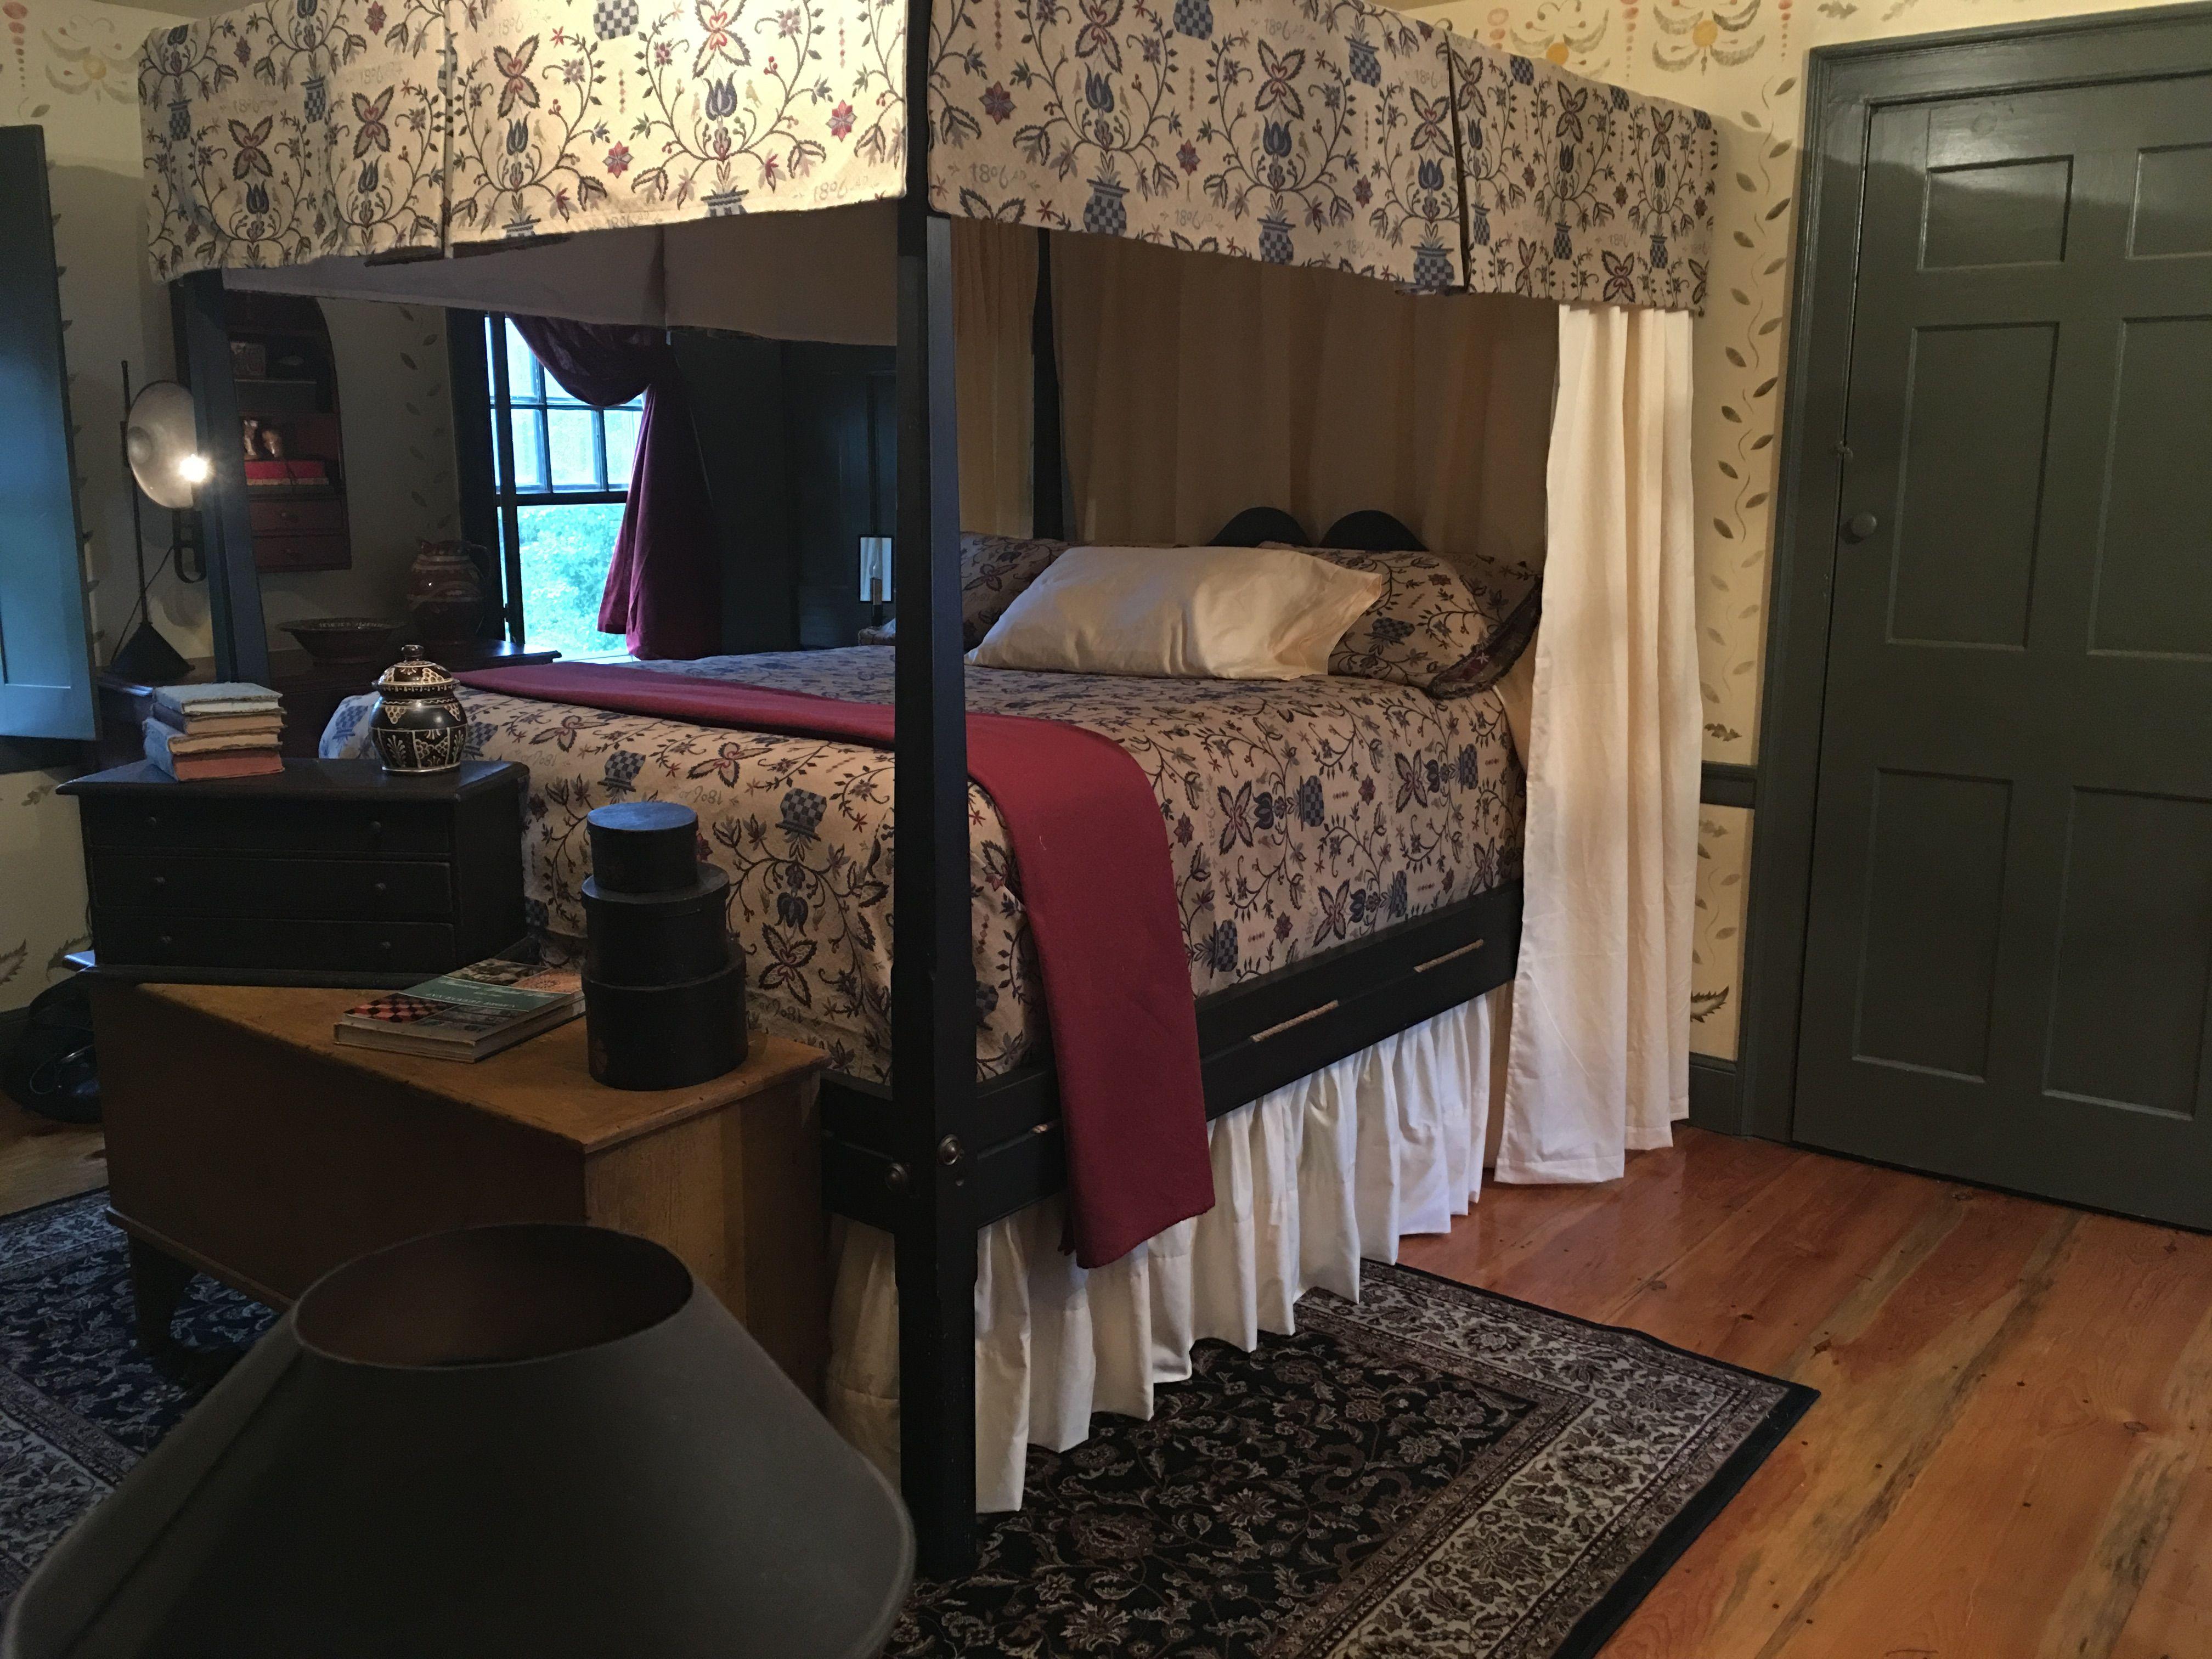 primitive bedroom. Primitive Bedroom  Colonial Decorating Canopy Beds Dream Rooms Sleep Tight Primitives Coast Farmhouse Poster Pin by Debi Skolas on HOME SWEET Pinterest